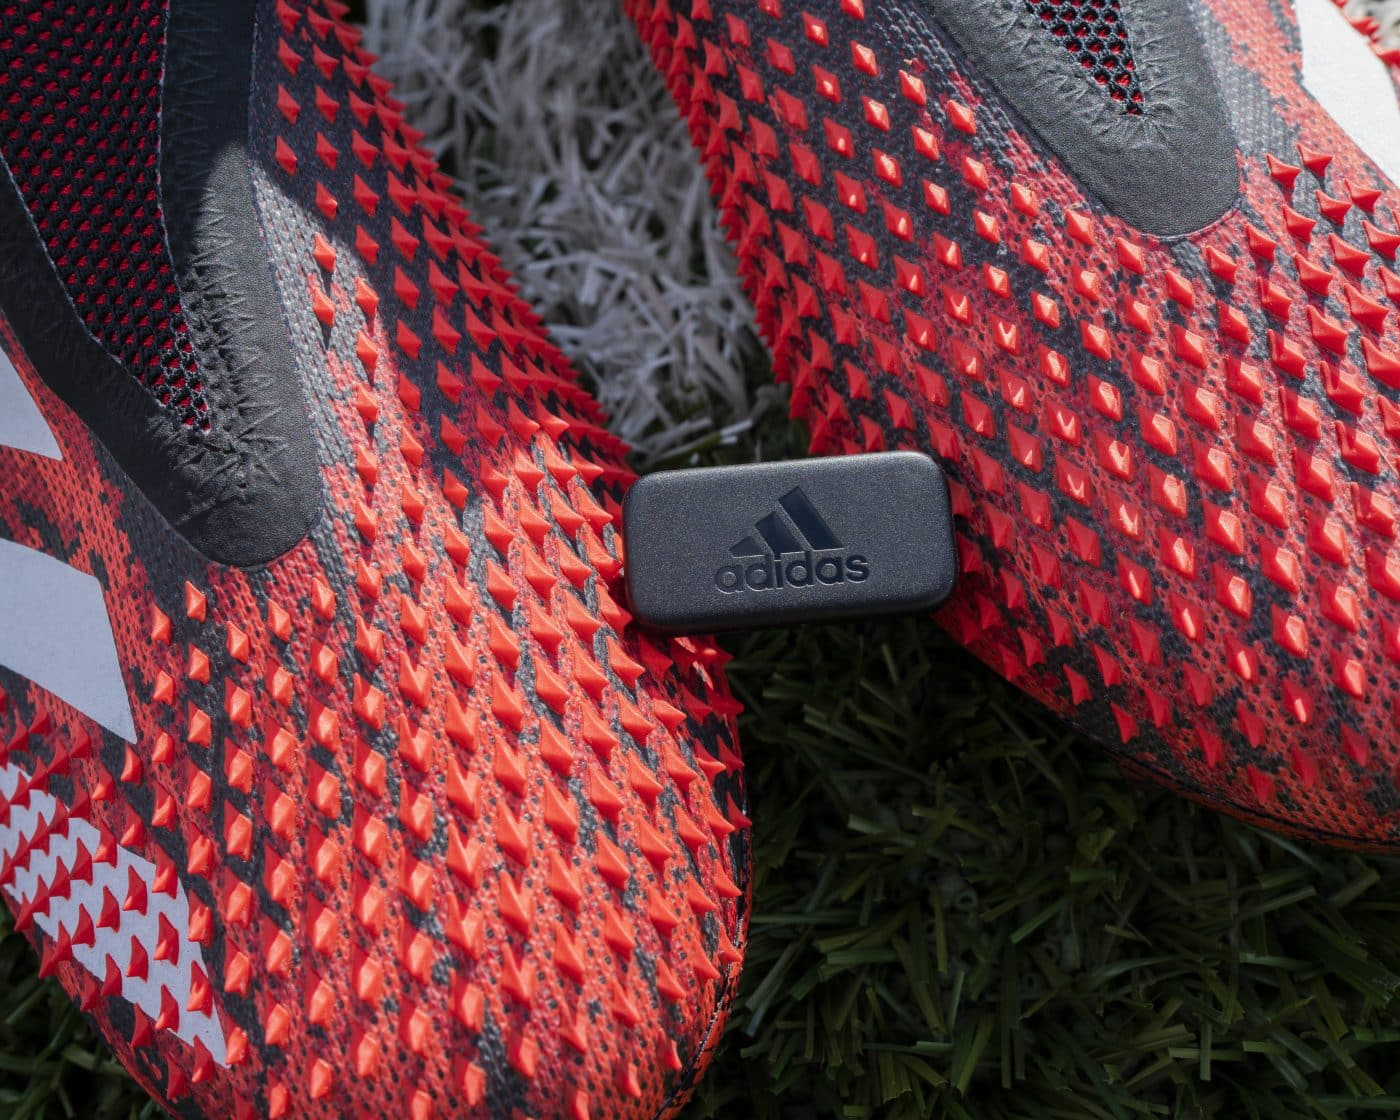 adidas-GMR-semelle-chaussures-de-foot-ea-sports-footpack-8